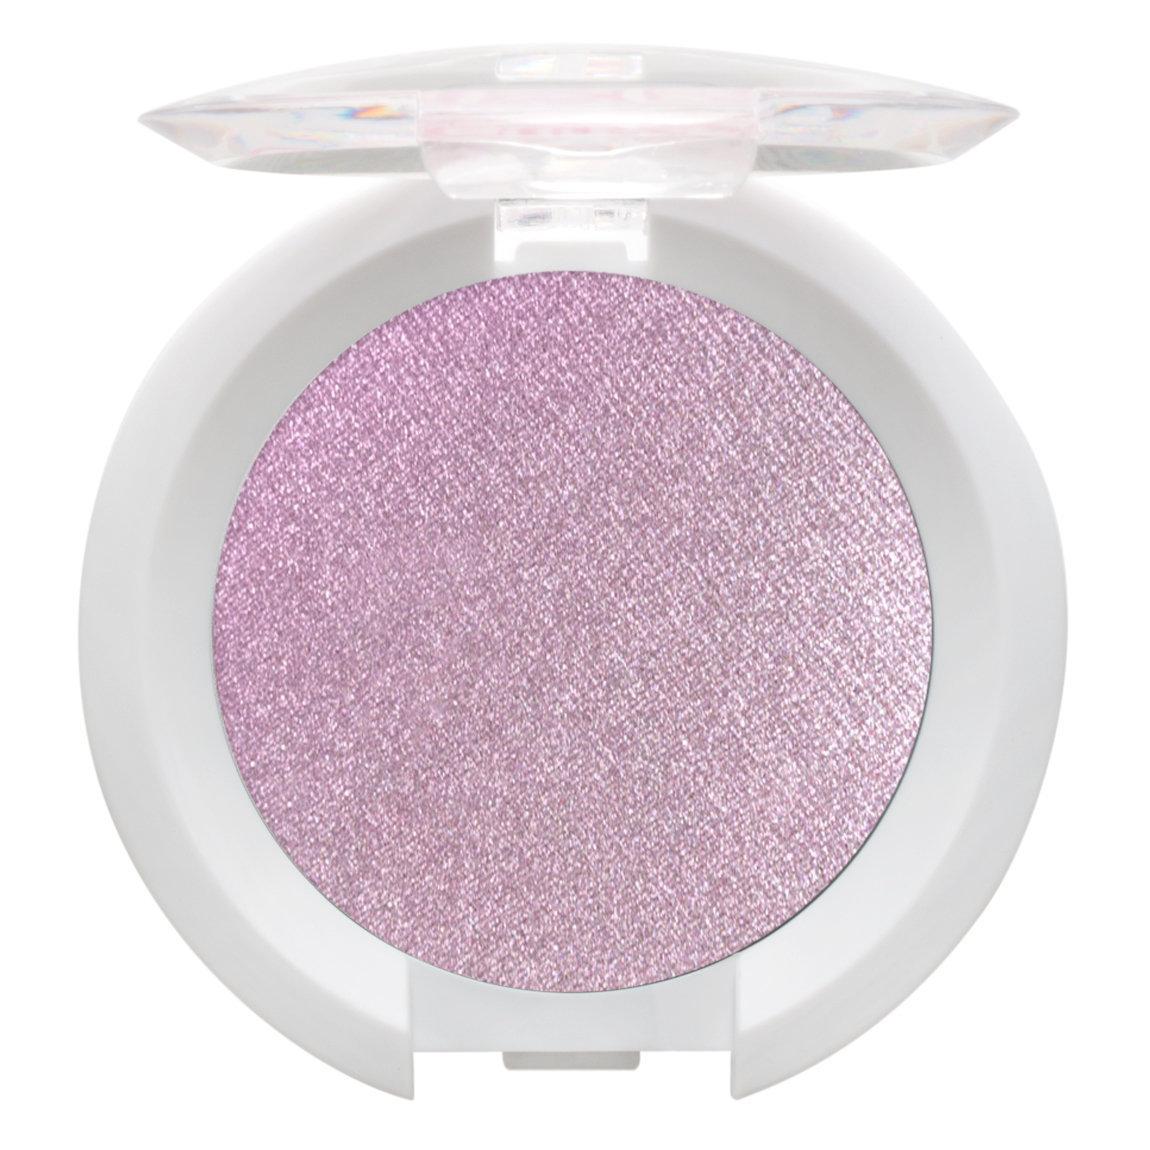 Sugarpill Cosmetics Pressed Eyeshadow Flurry alternative view 1 - product swatch.